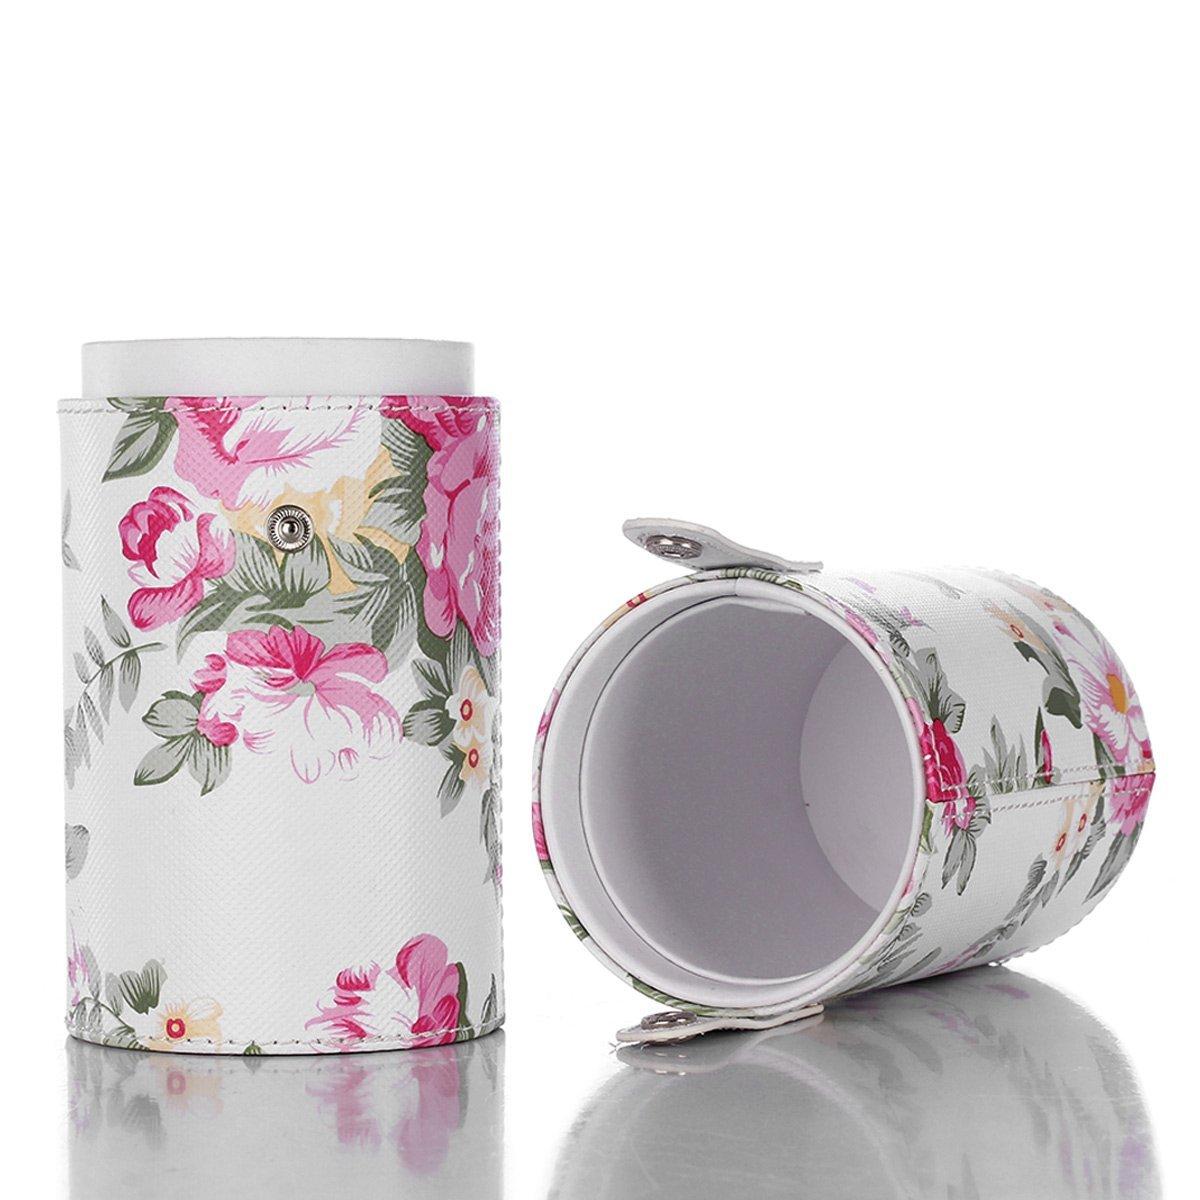 Makeup Brush Cup Holder PU Leather Make Up Cosmetics Organizer Travel Pouch Storage Stationery Bag Case(Stripe Black) … EMOCCI-B-Cup-Black